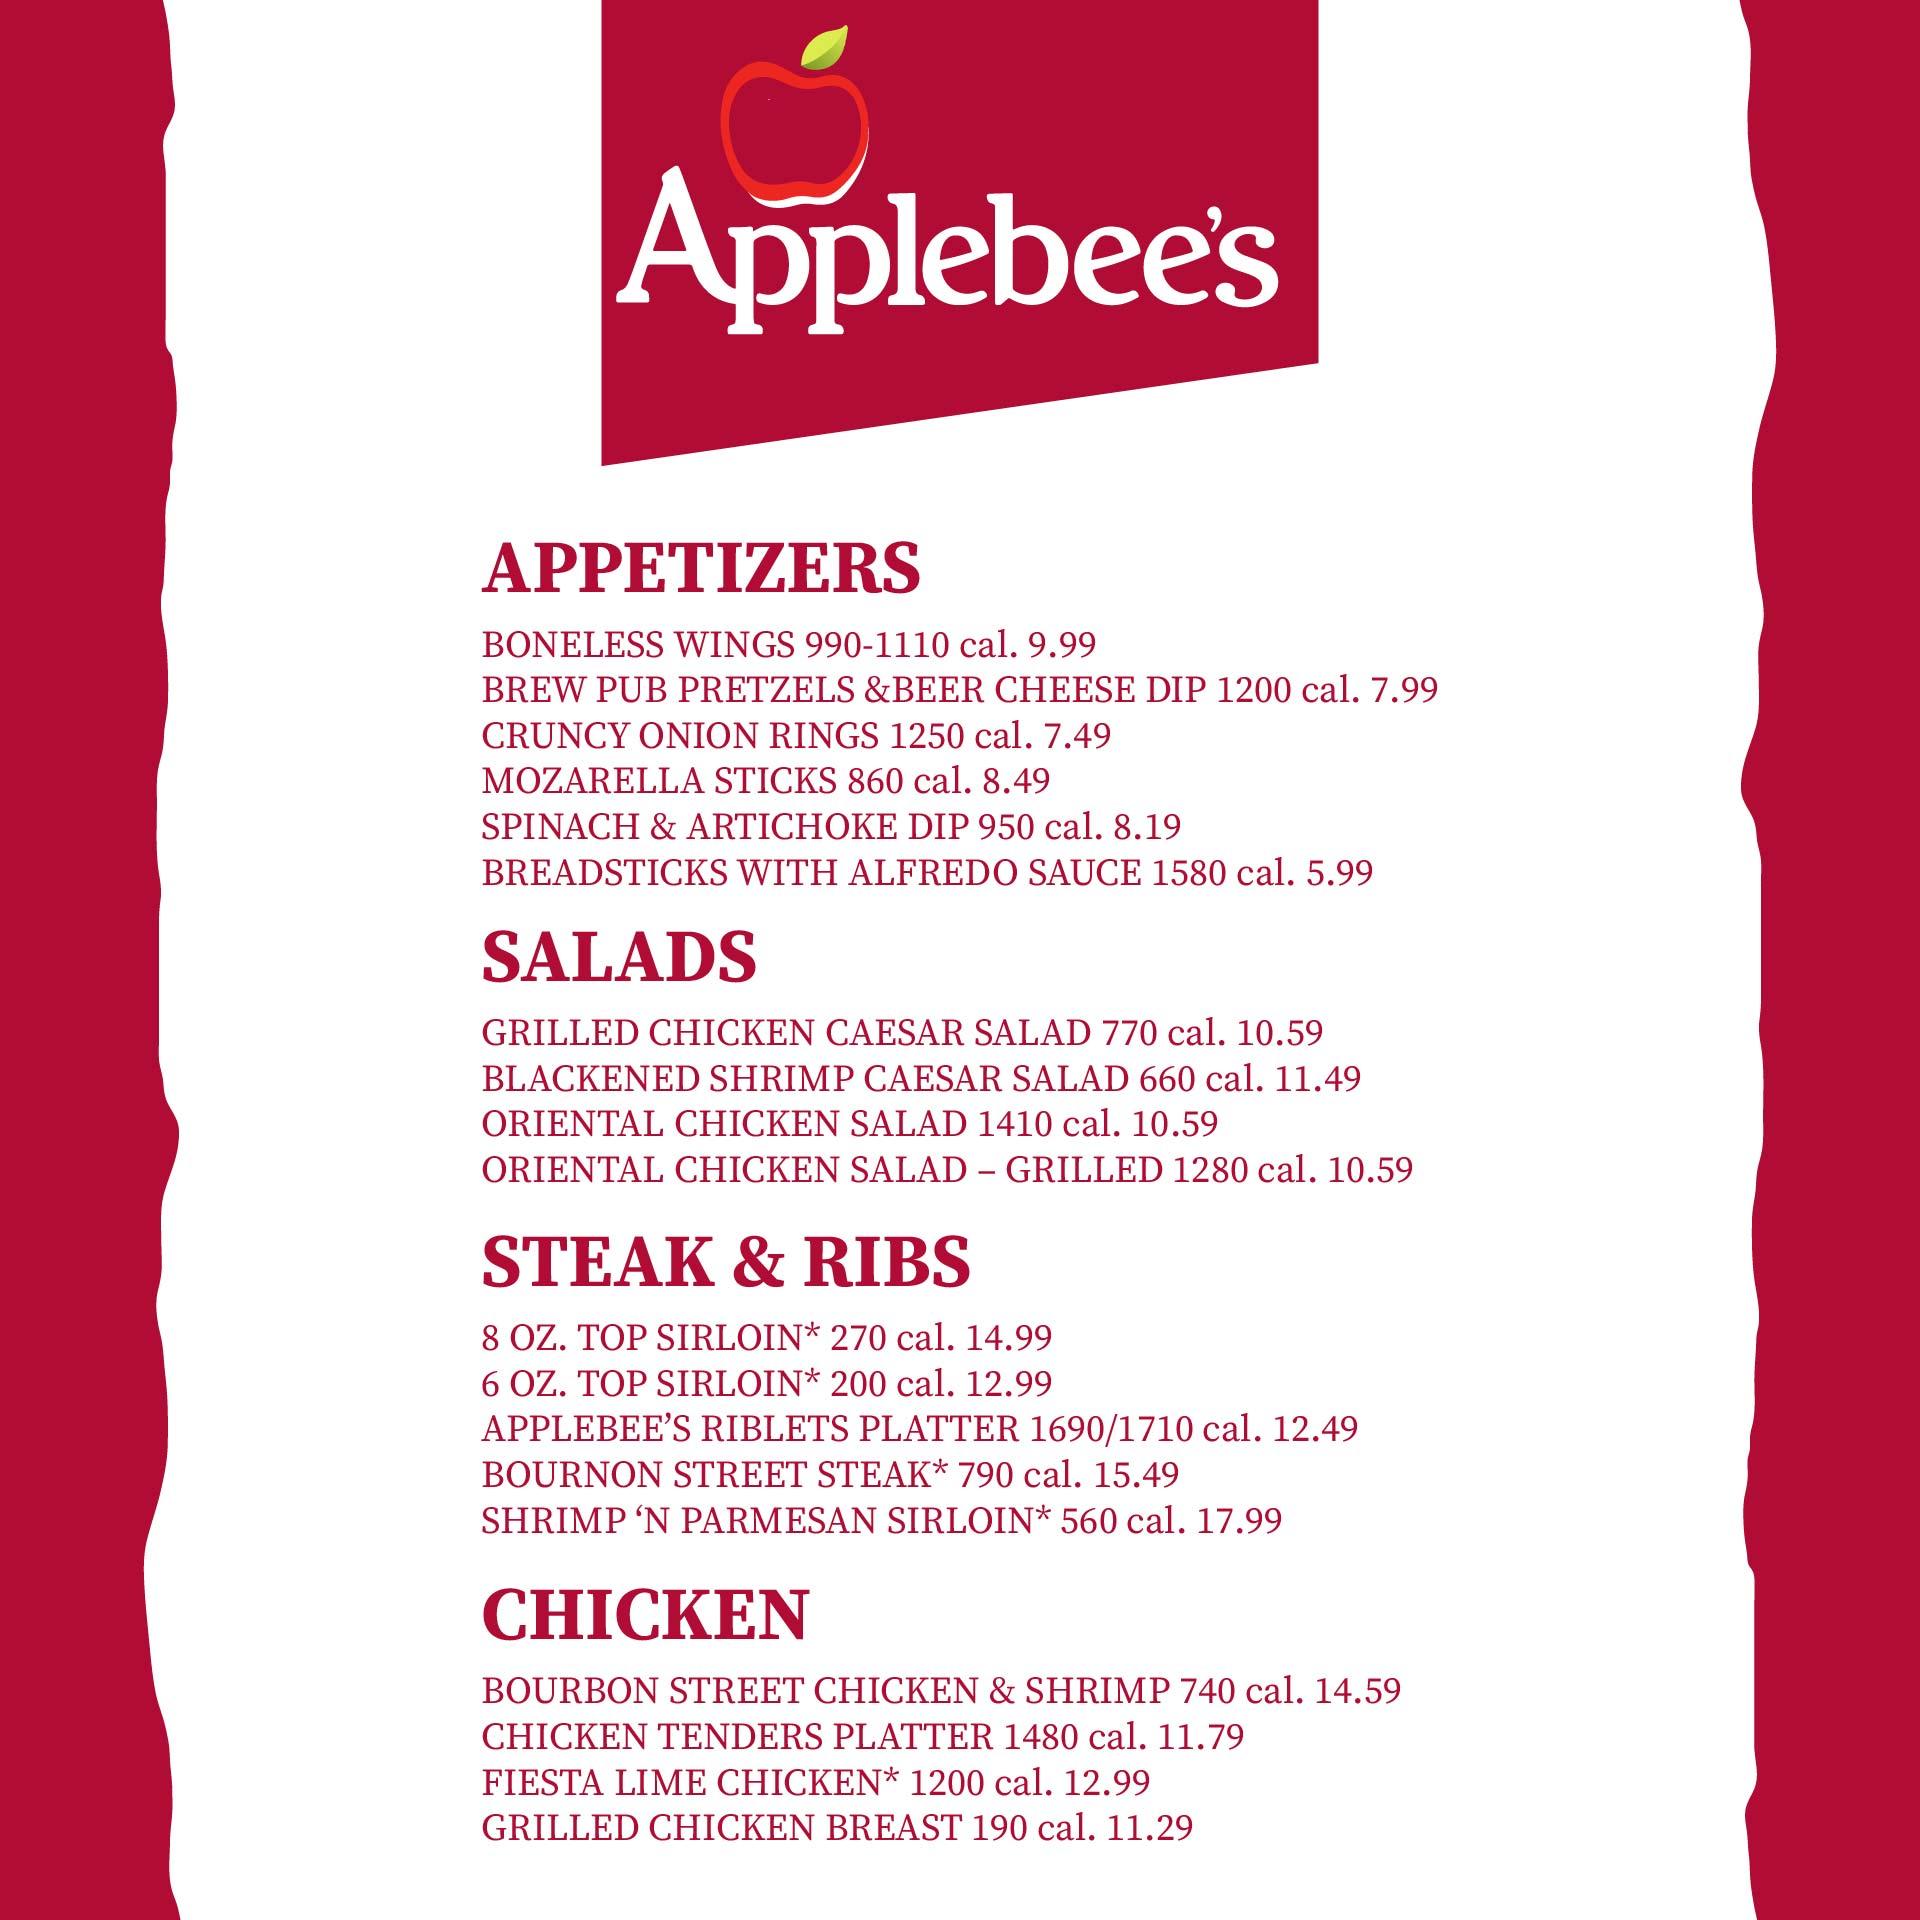 Applebees Menu with Prices